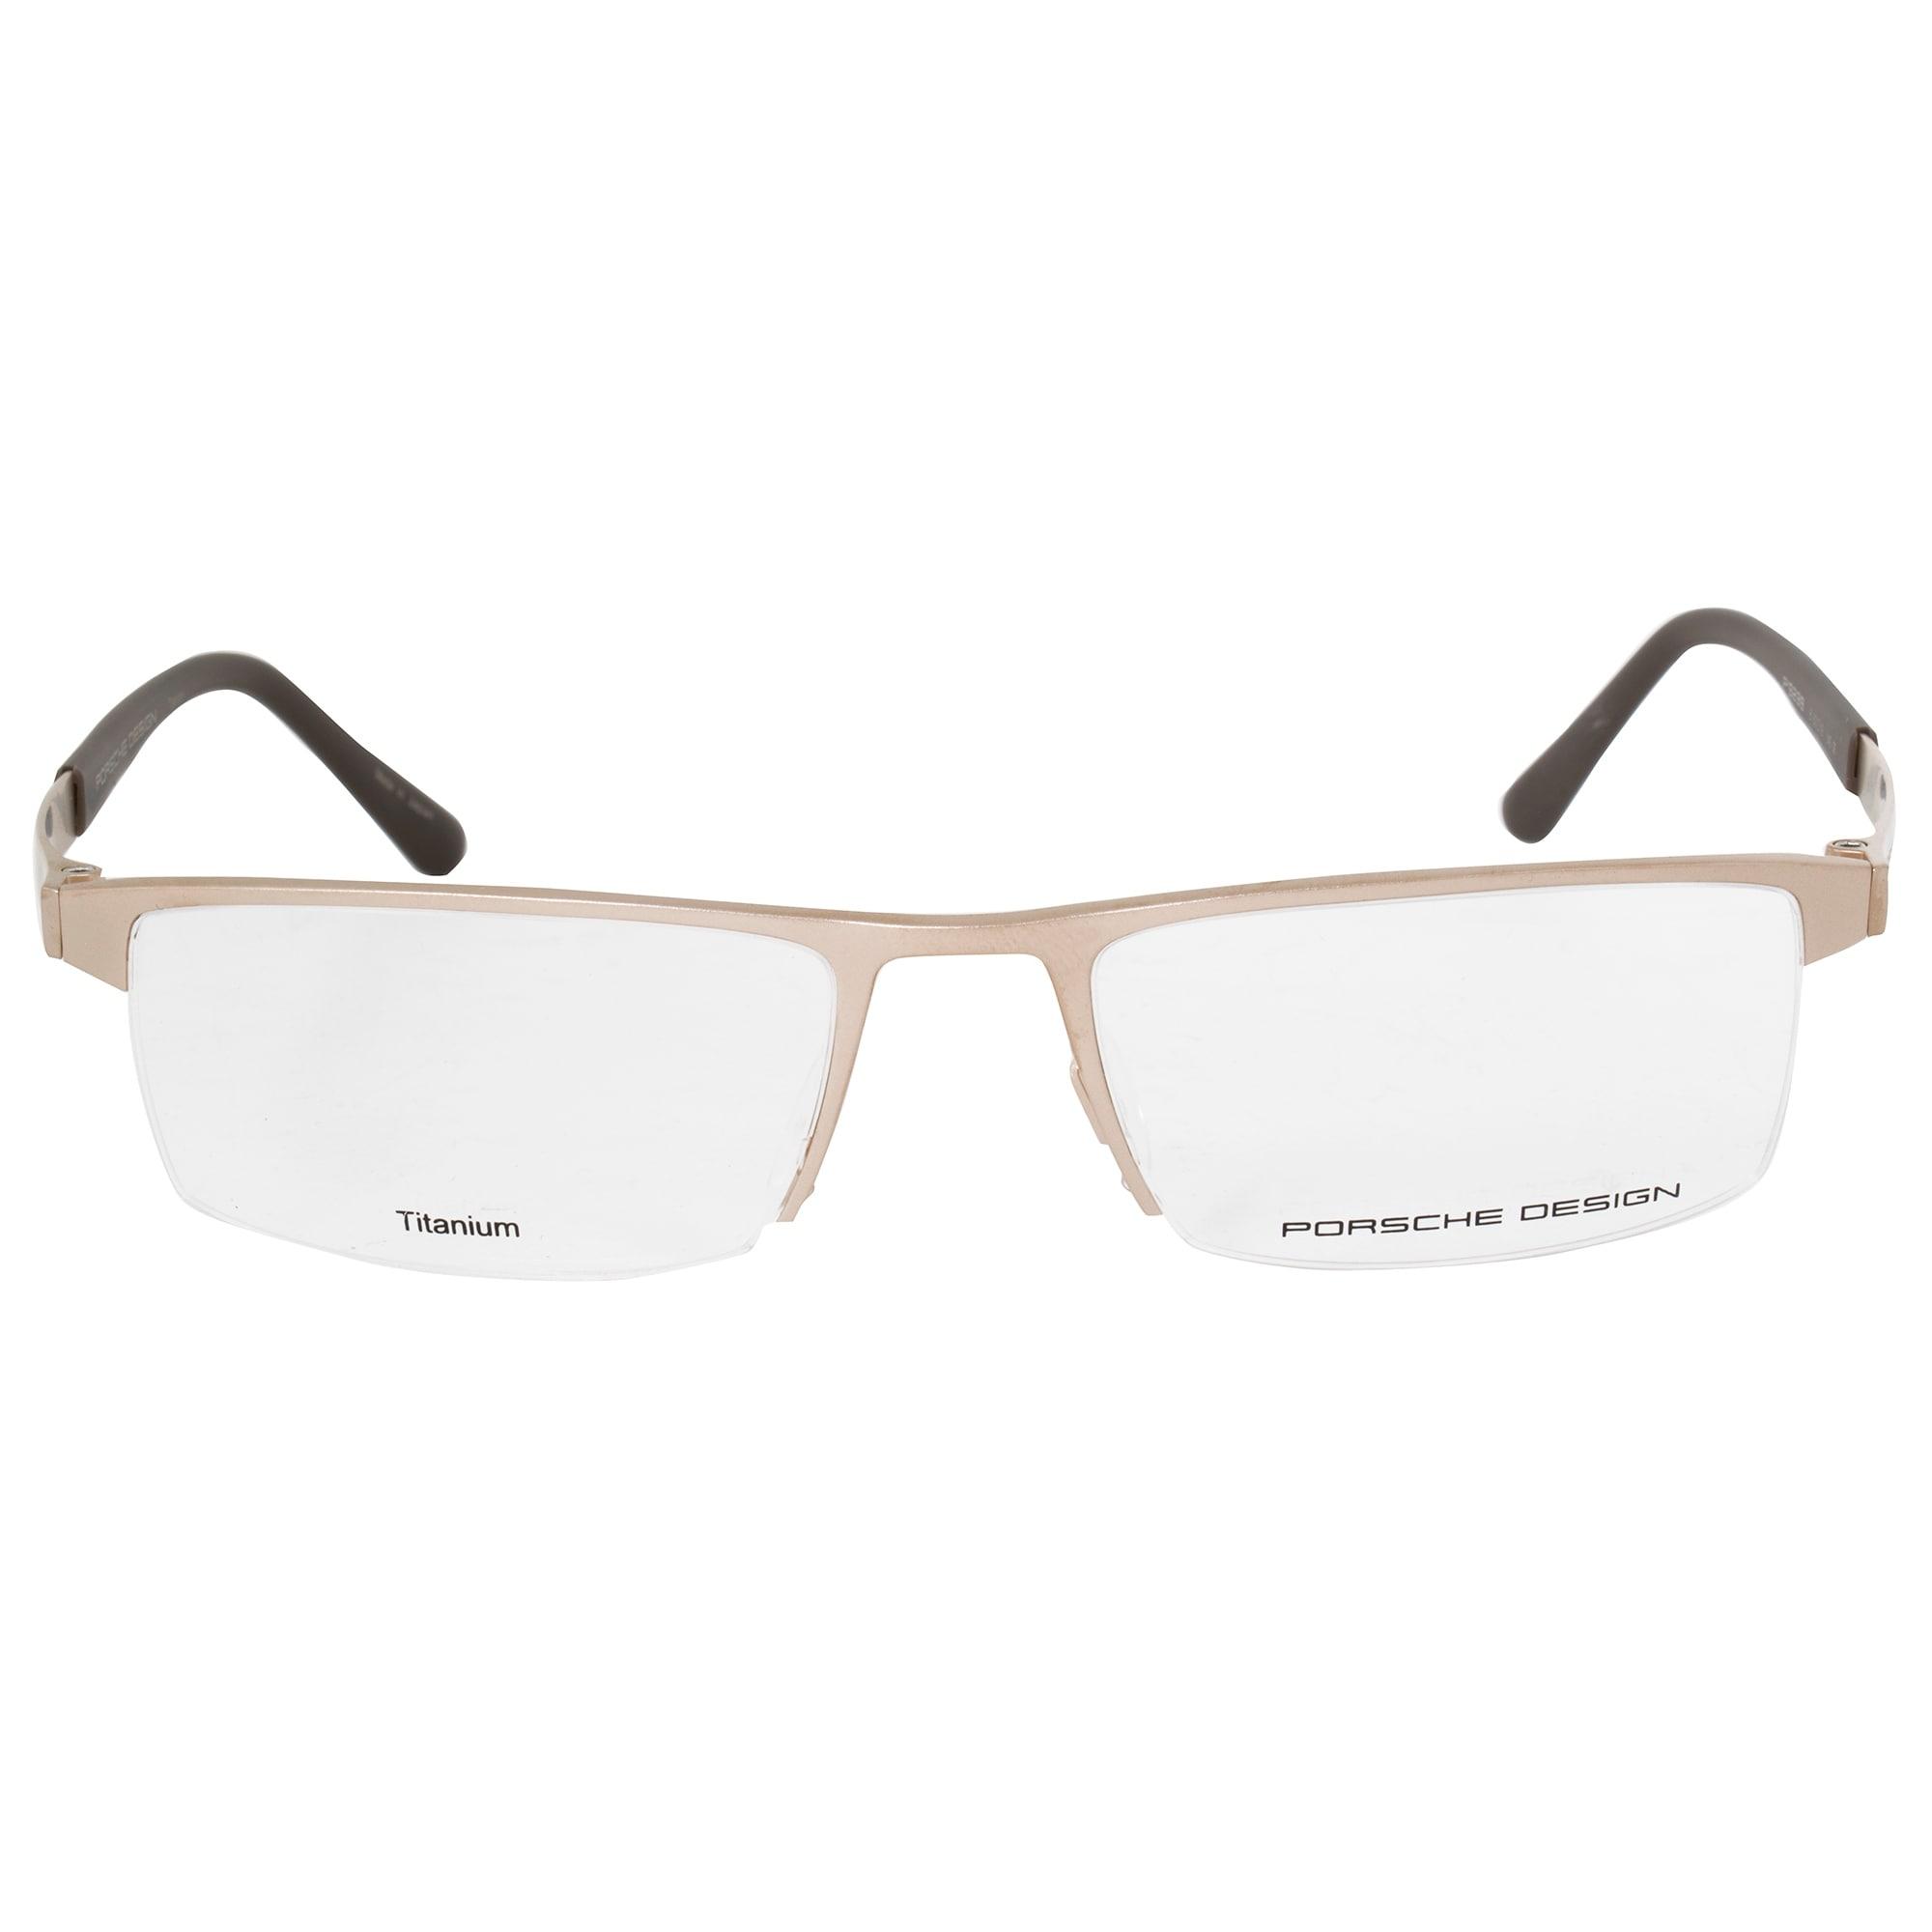 e2b6e0959b5 Buy Porsche Design Optical Frames Online at Overstock